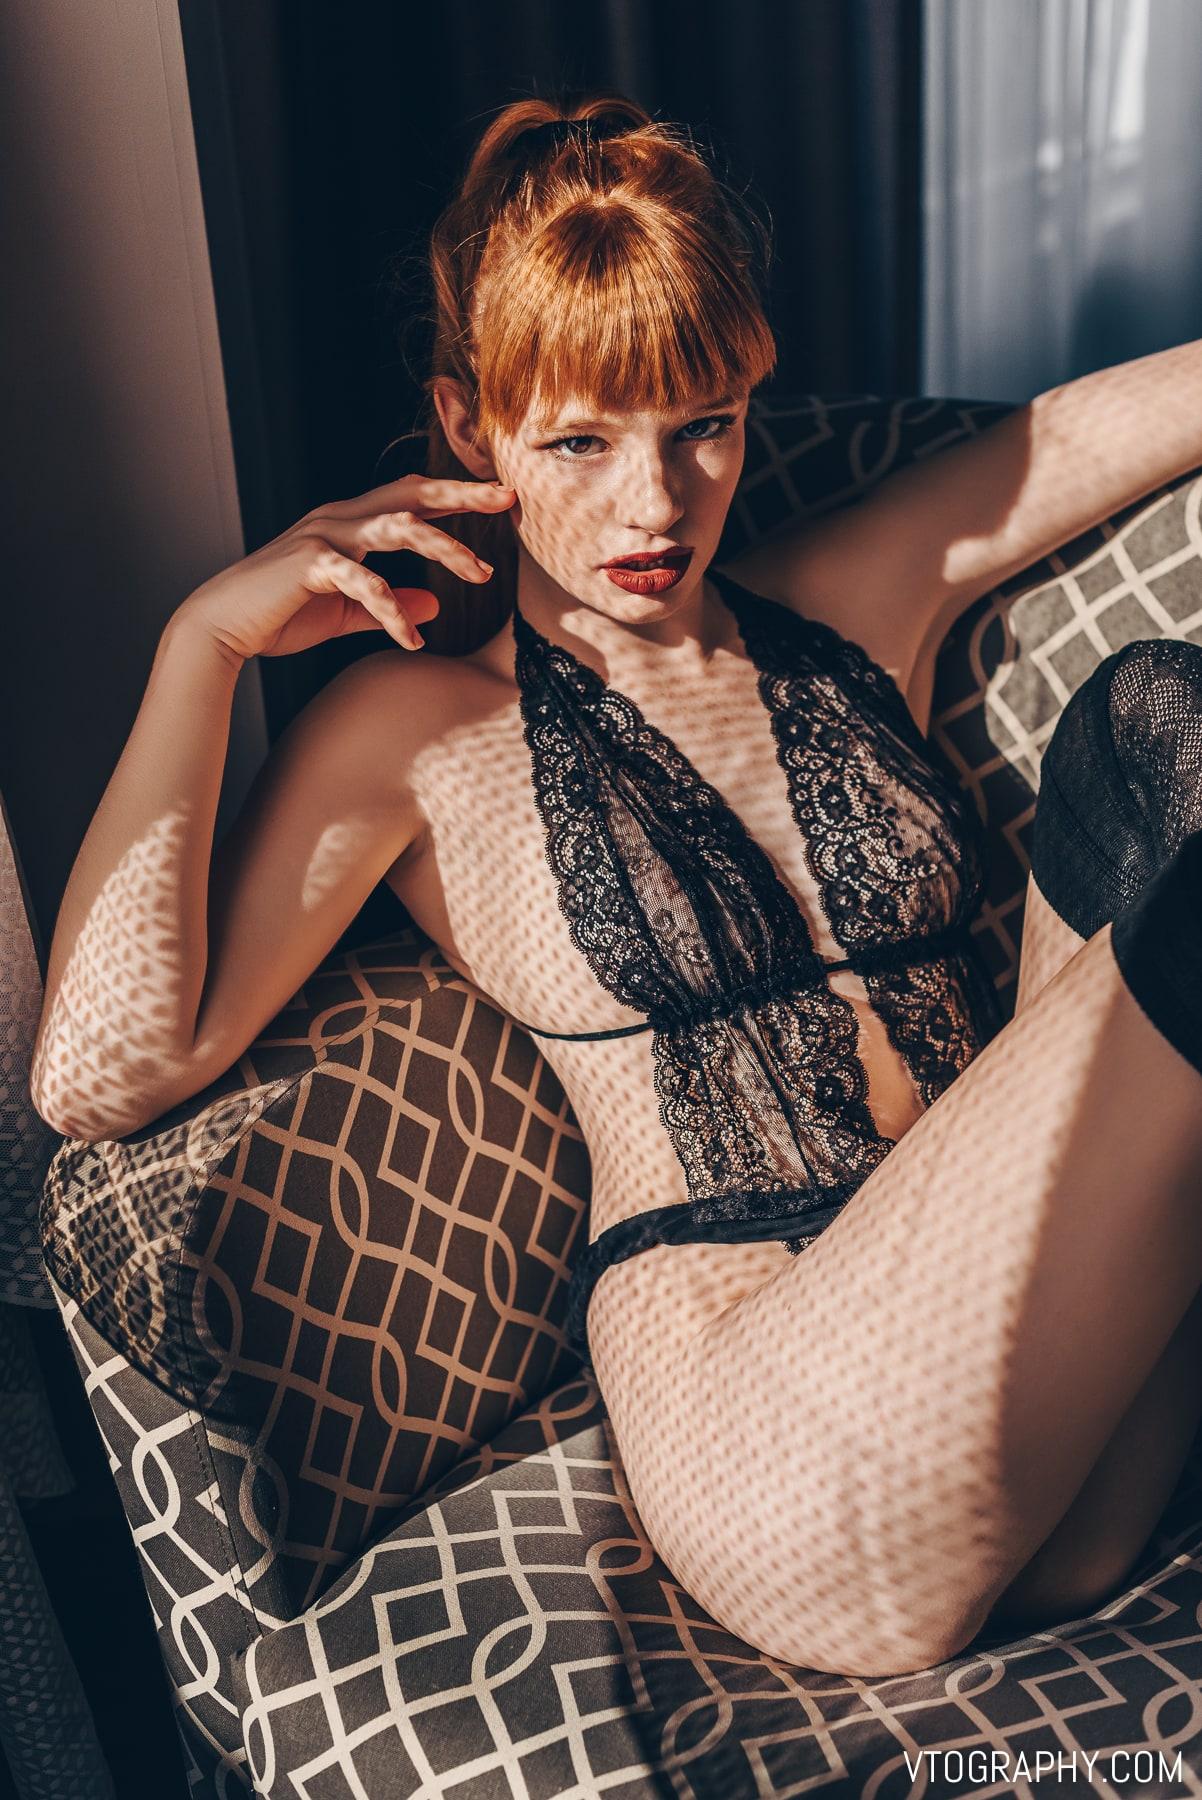 Boudoir photo shoot with redhead model Jamie aka @jamtothejars